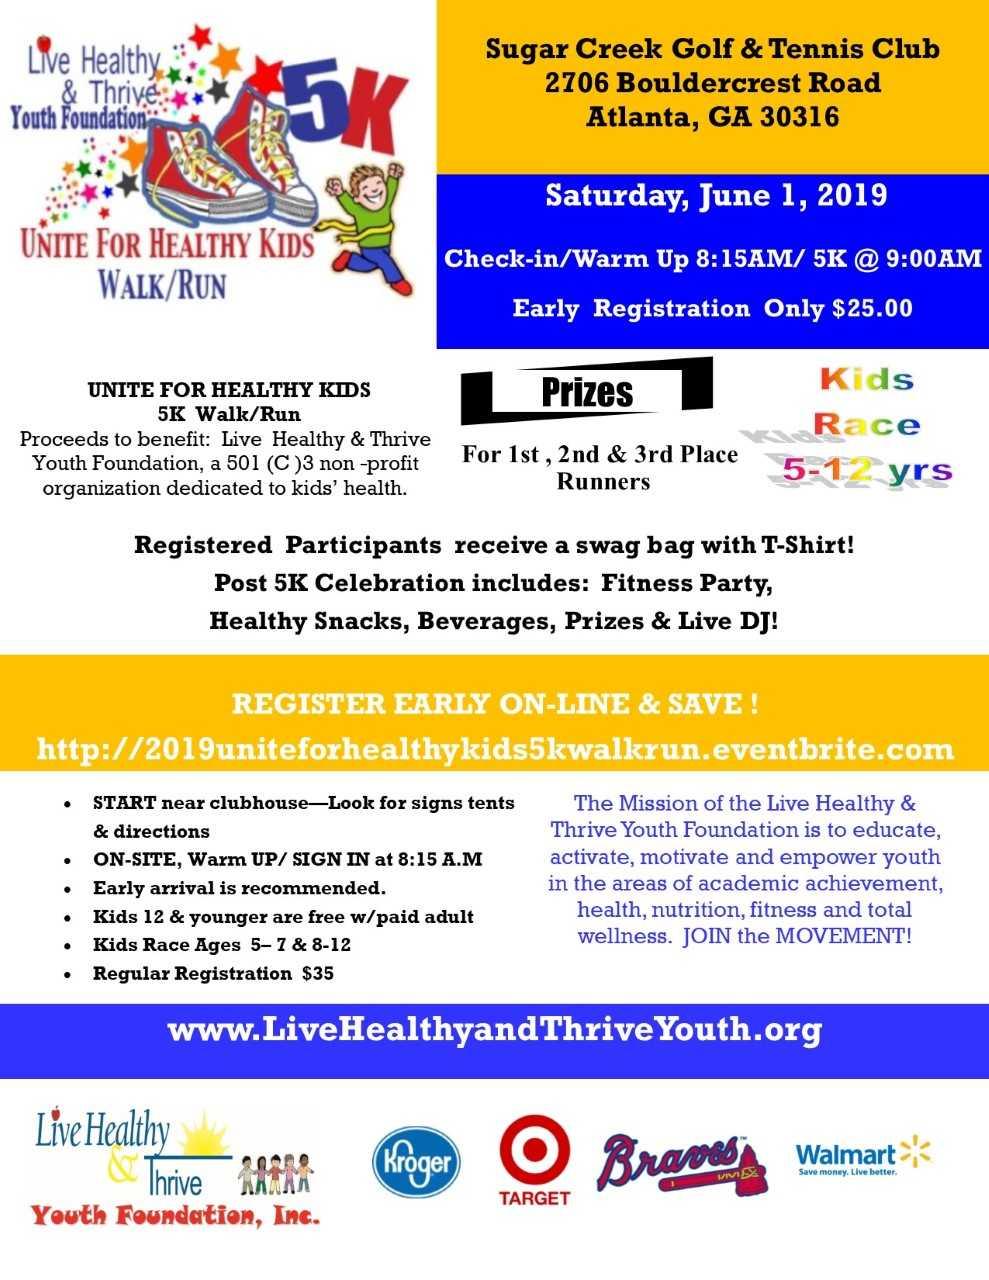 9th Annual Unite for Healthy Kids 5K Walk and Run